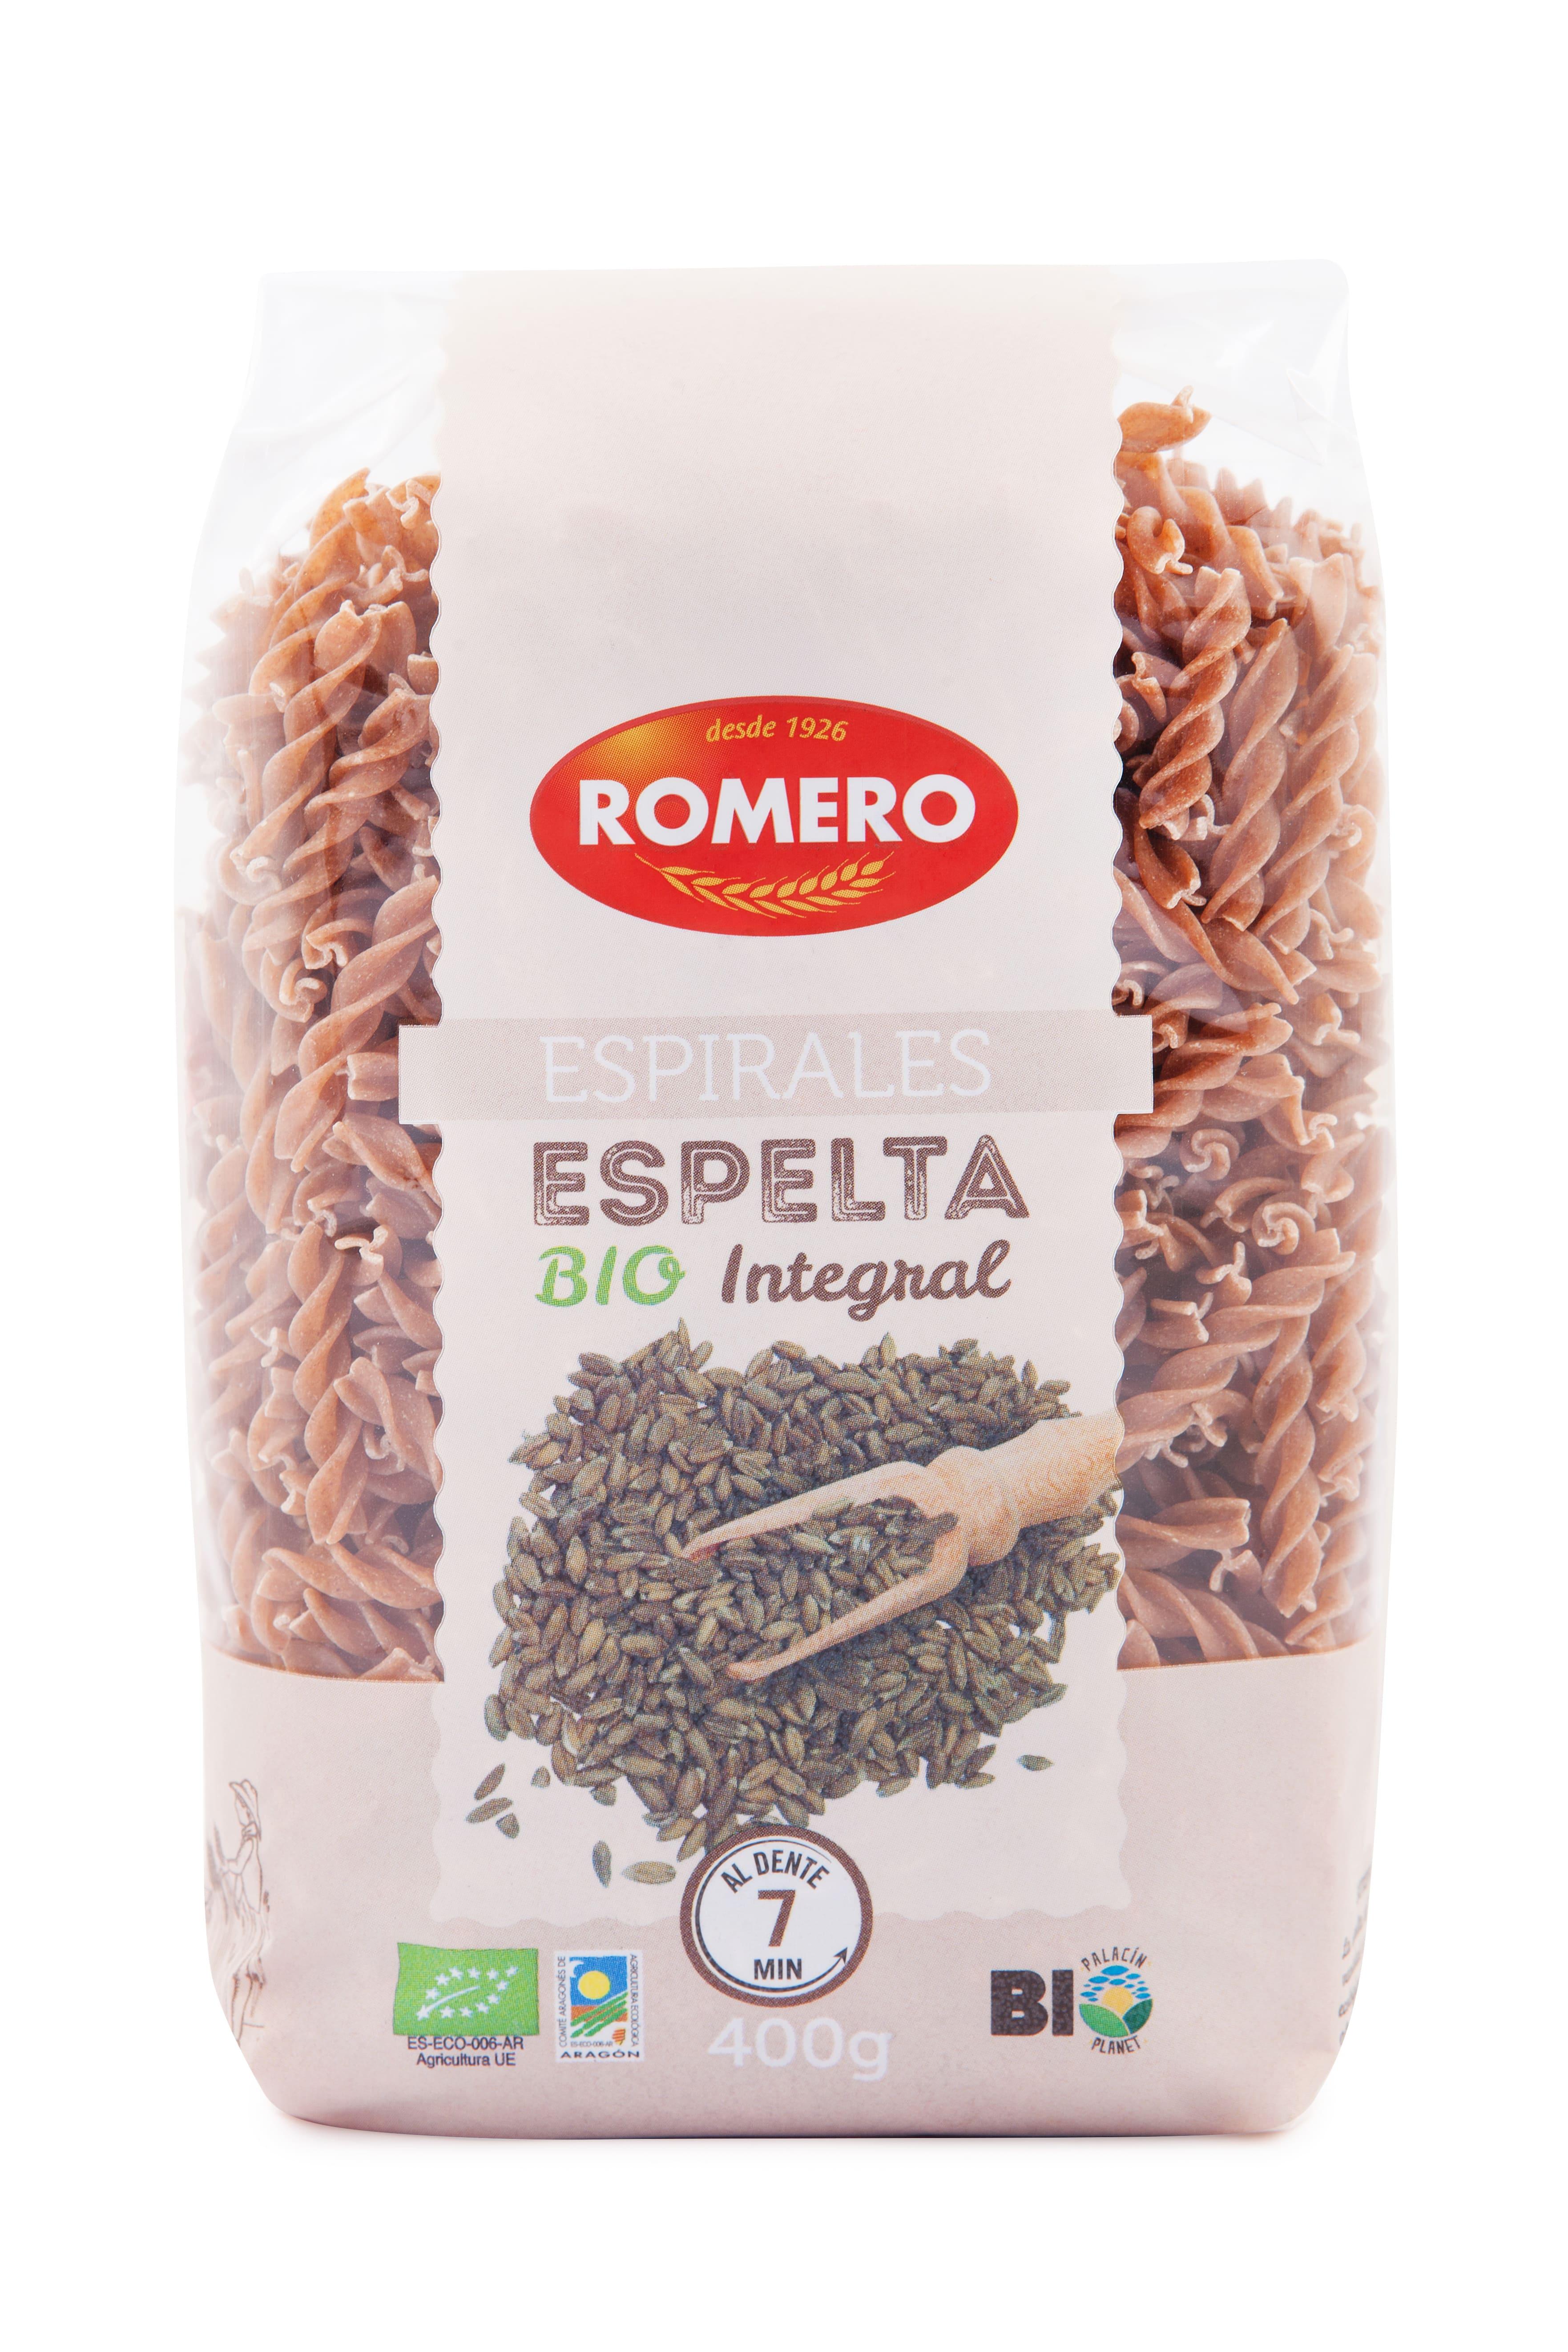 Espelta de Pastas Romero